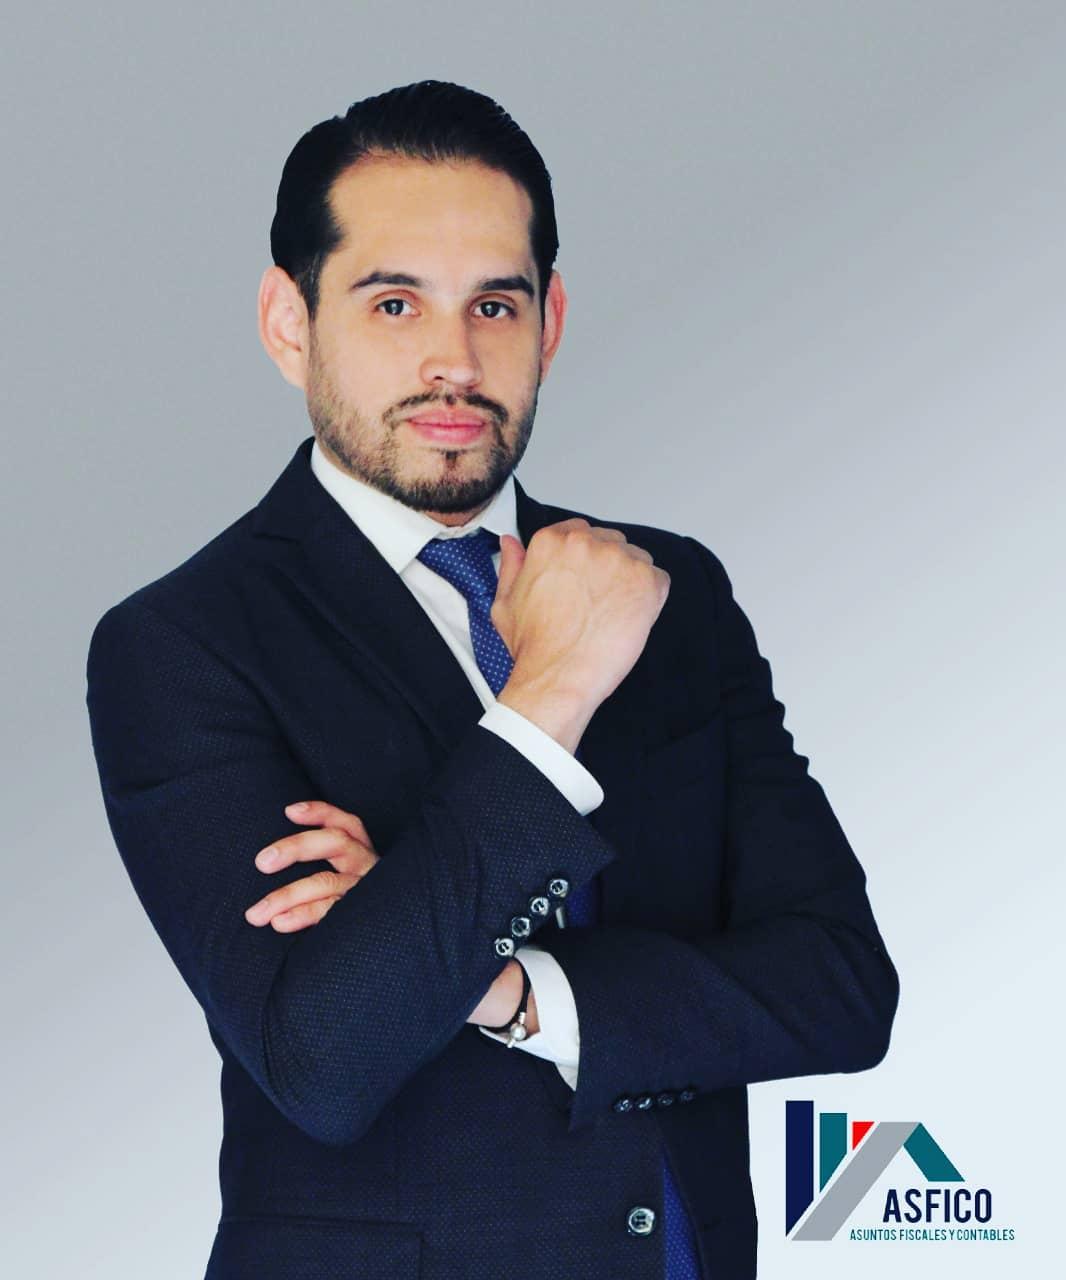 2.-Gerente GeneralL -General Manager C.P. Sergio Fernando Zavala Castillo